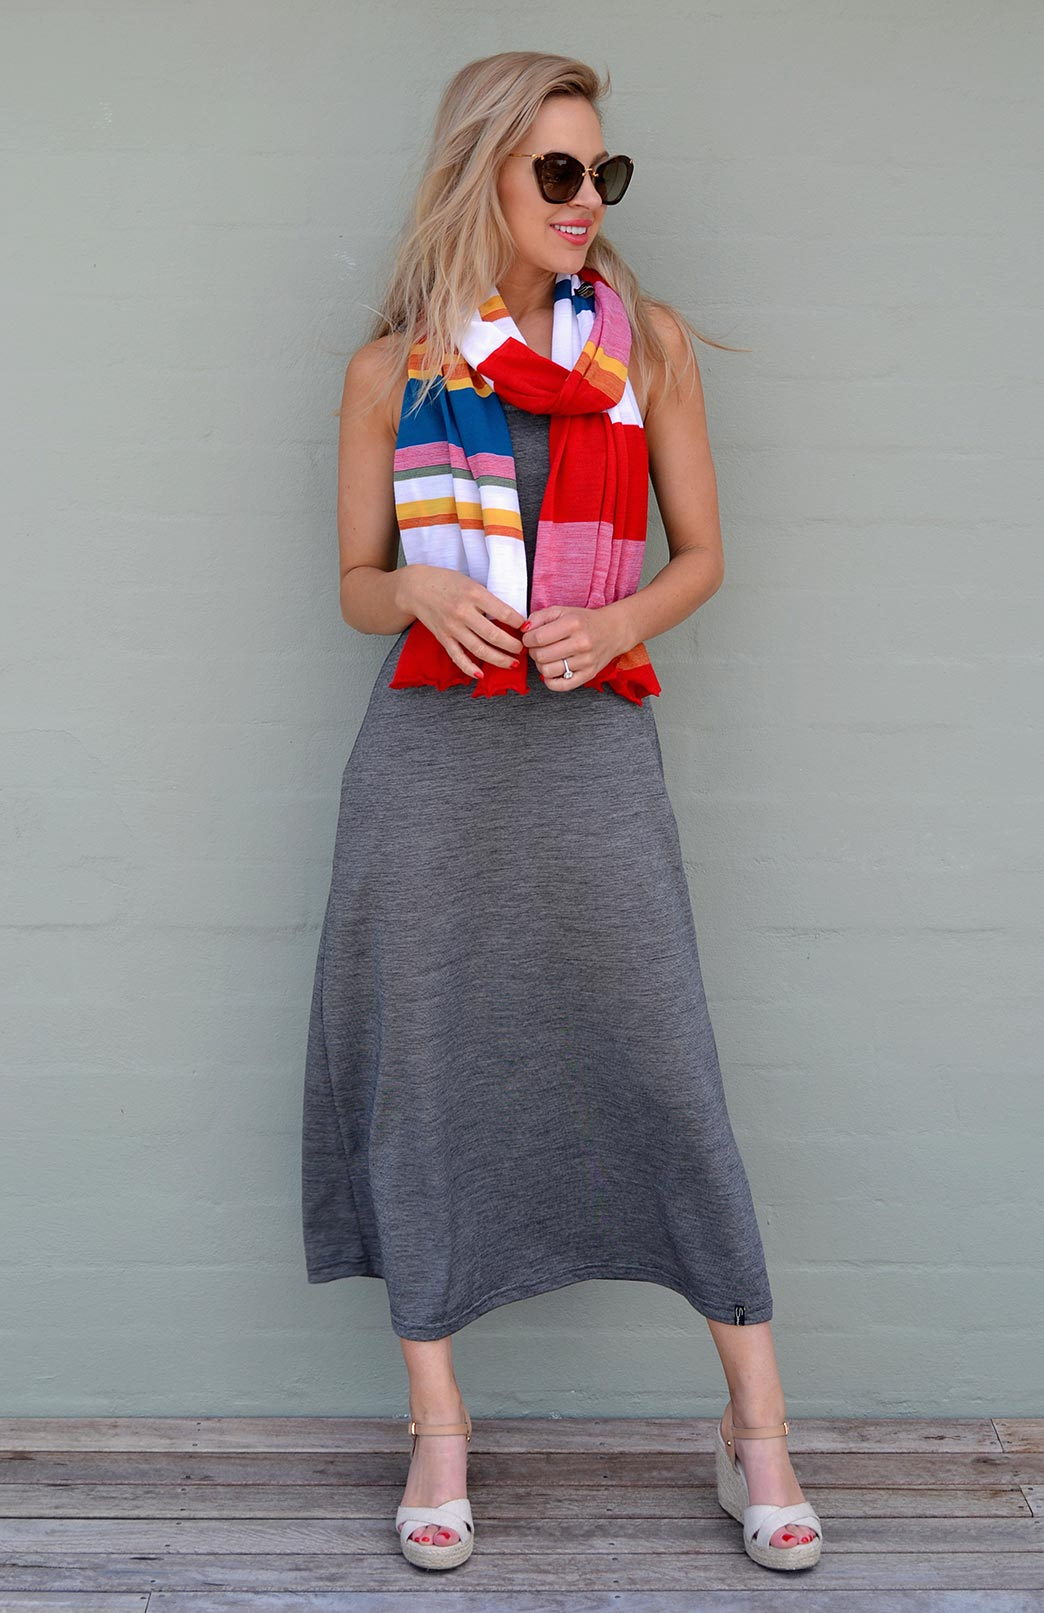 Scarves - Multi Striped - Women's Superfine Merino Wool Classic Wide Scarf - Smitten Merino Tasmania Australia